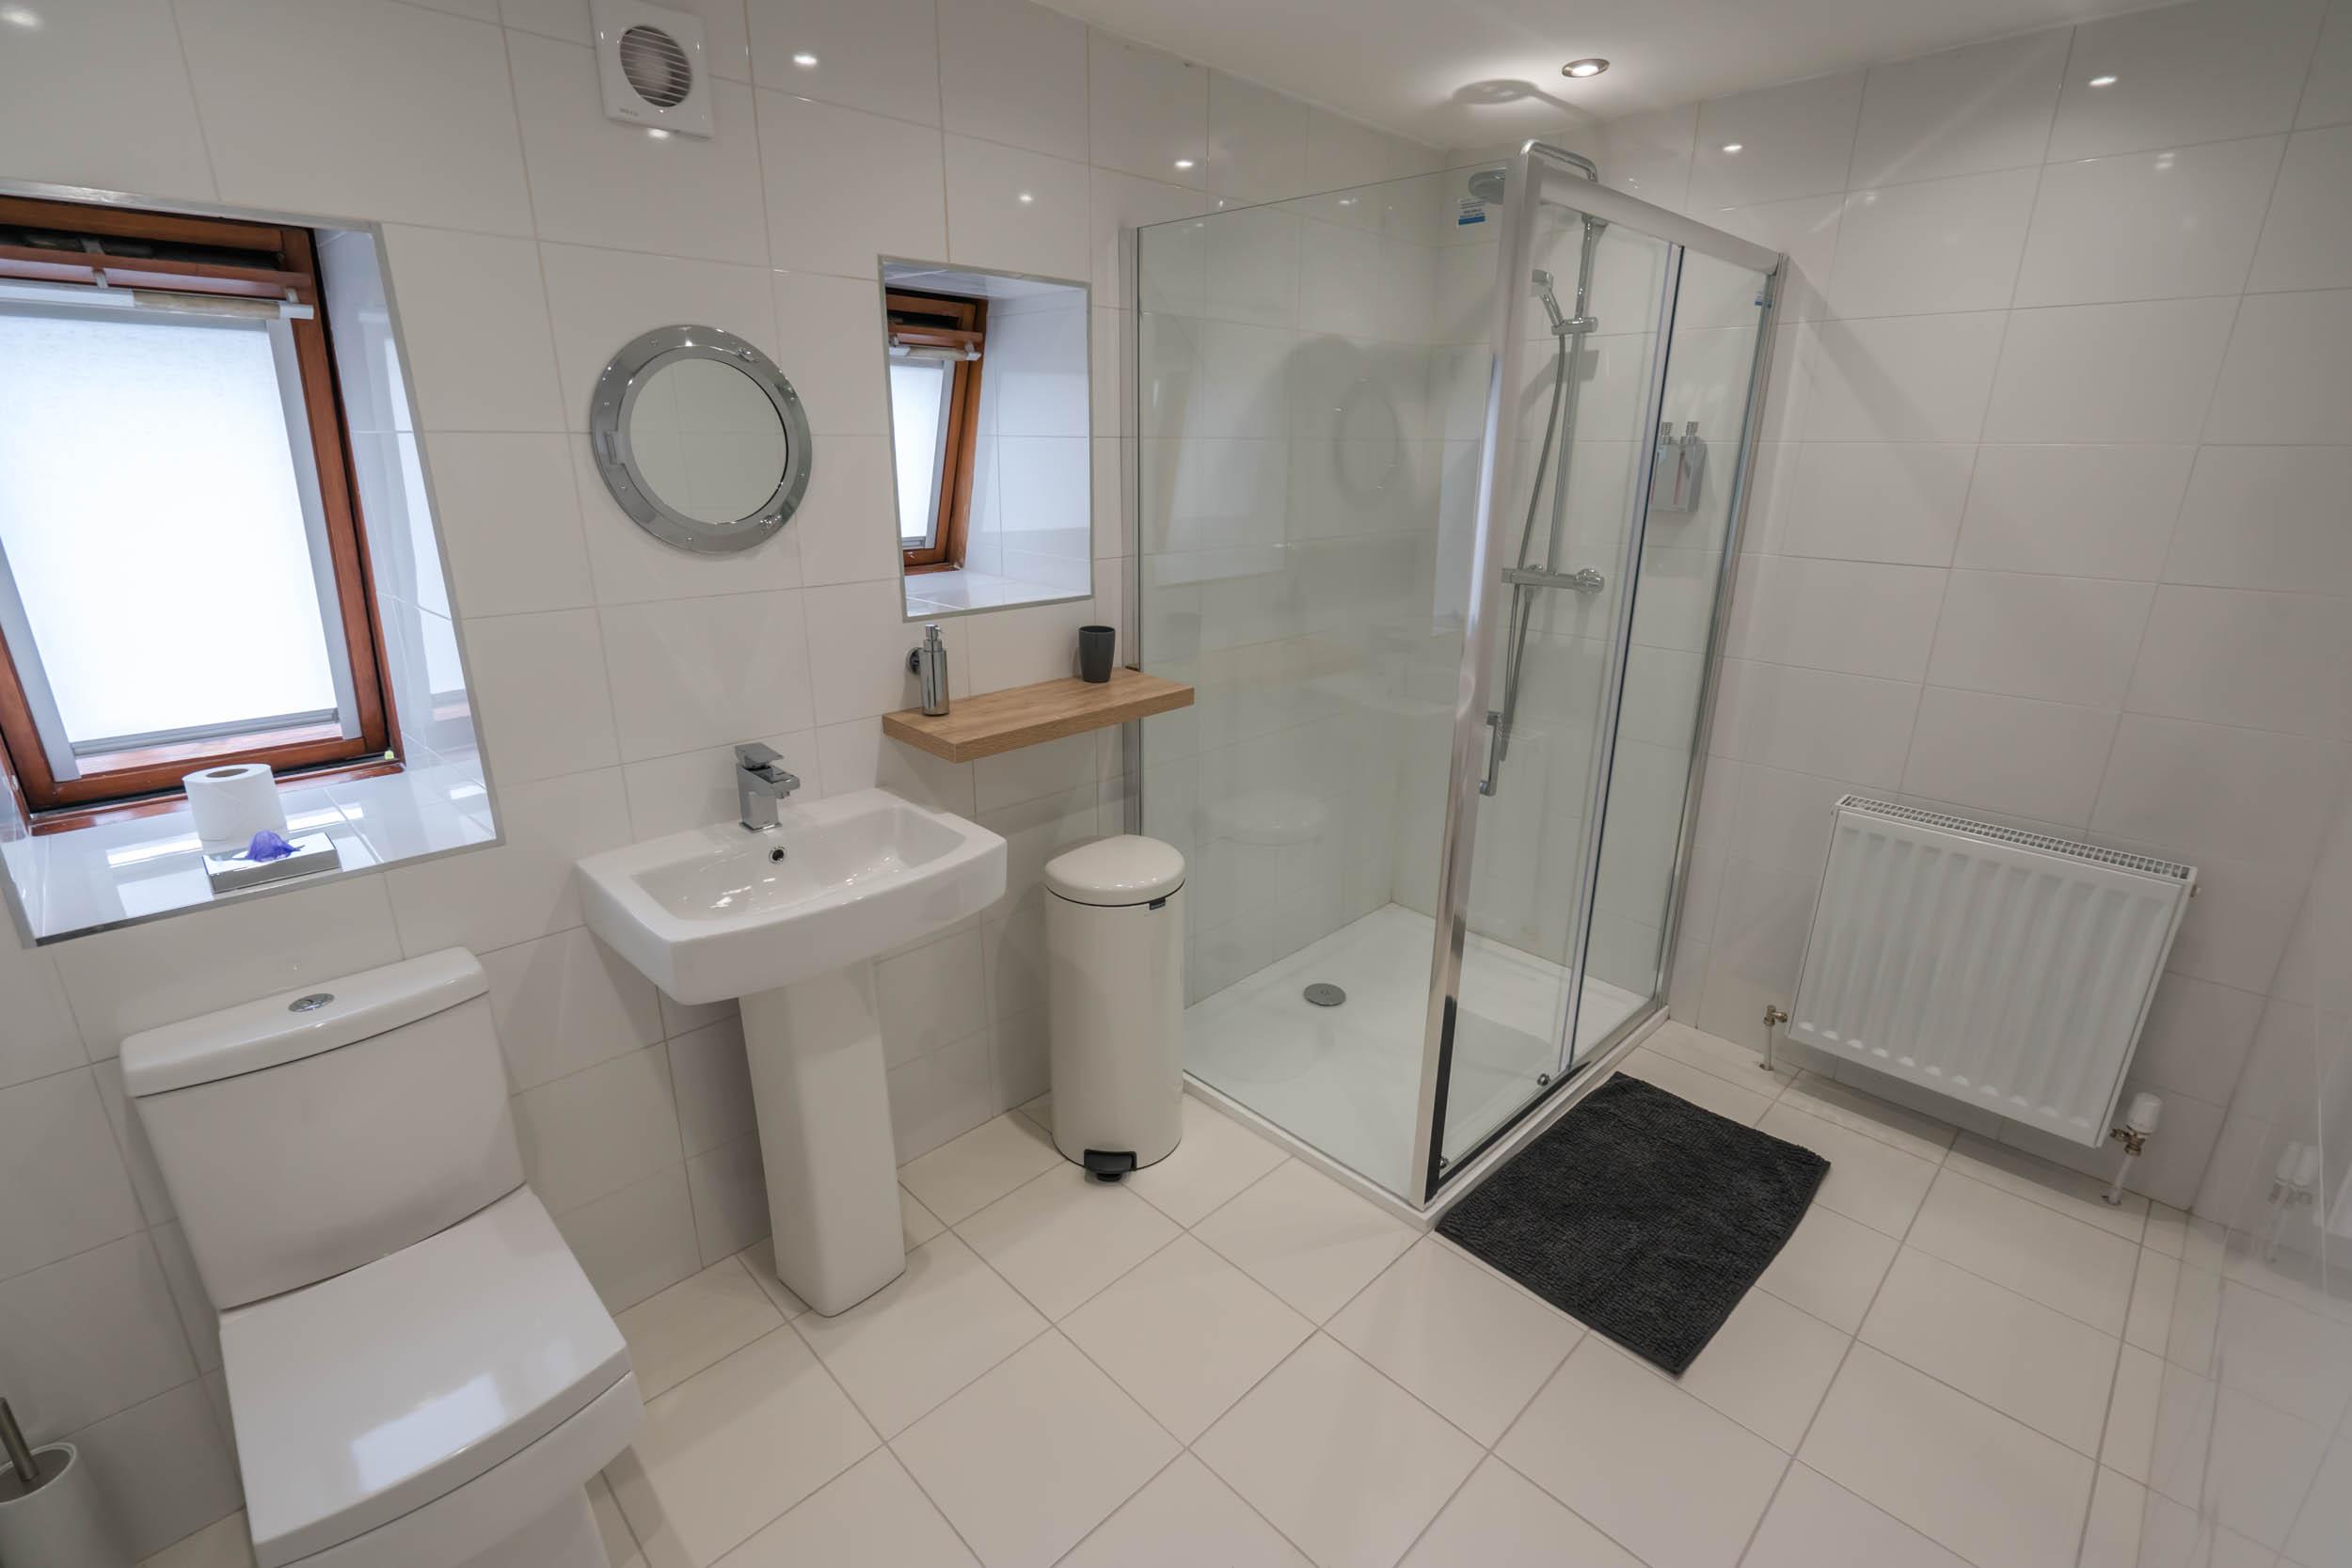 Clachan-Inn-Paul-Saunders-03210.jpg